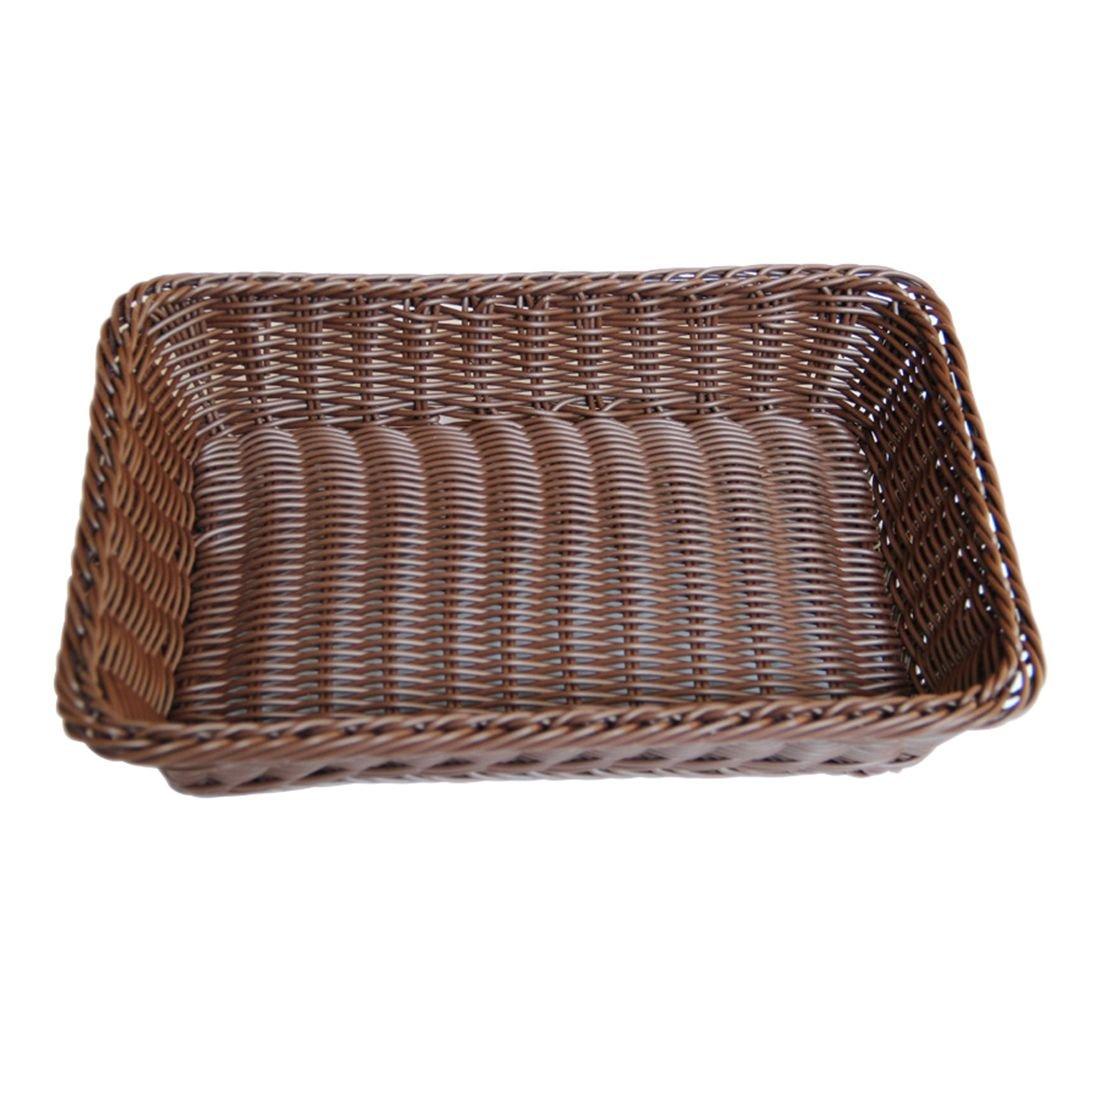 SODIAL Dark Brown Simple Fashion Hand-Woven Storage Basket Rattan Food Fruit Basket Imitation Rattan Bread Basket 30x20x7cm